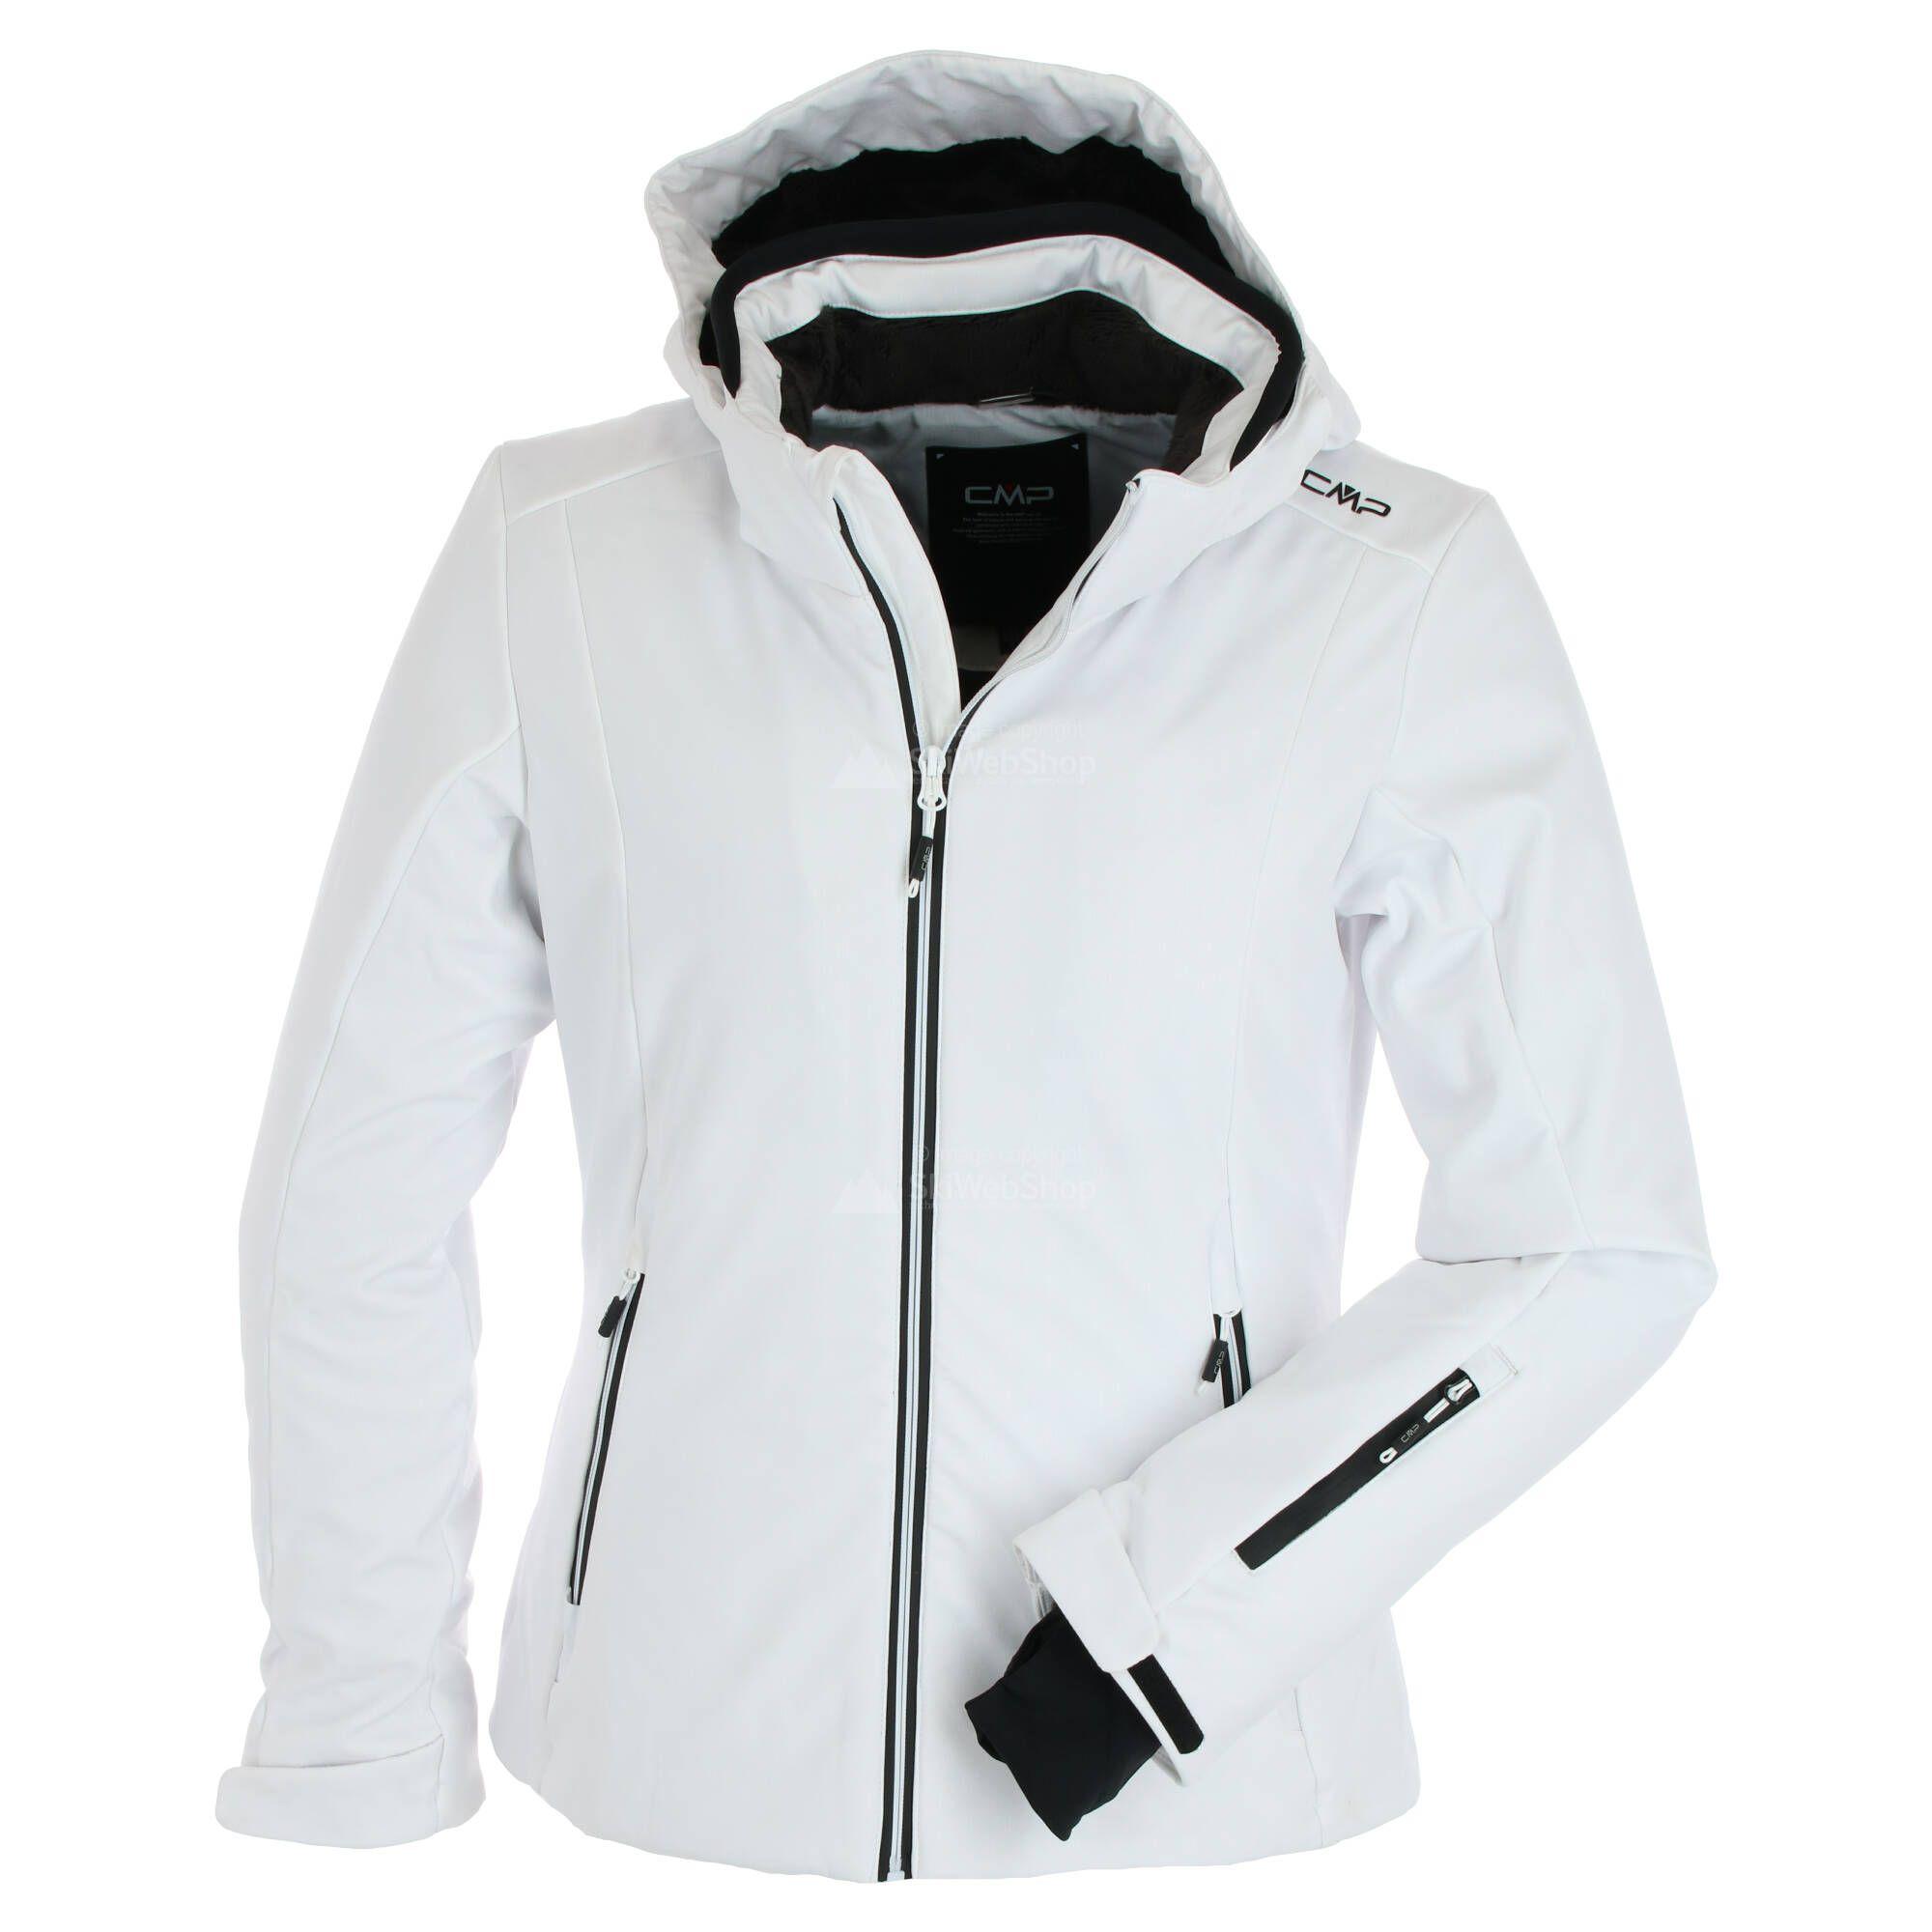 Details about  /CMP Ski Jacket Snowboard Jacket Woman Zip Hood Dark Blue